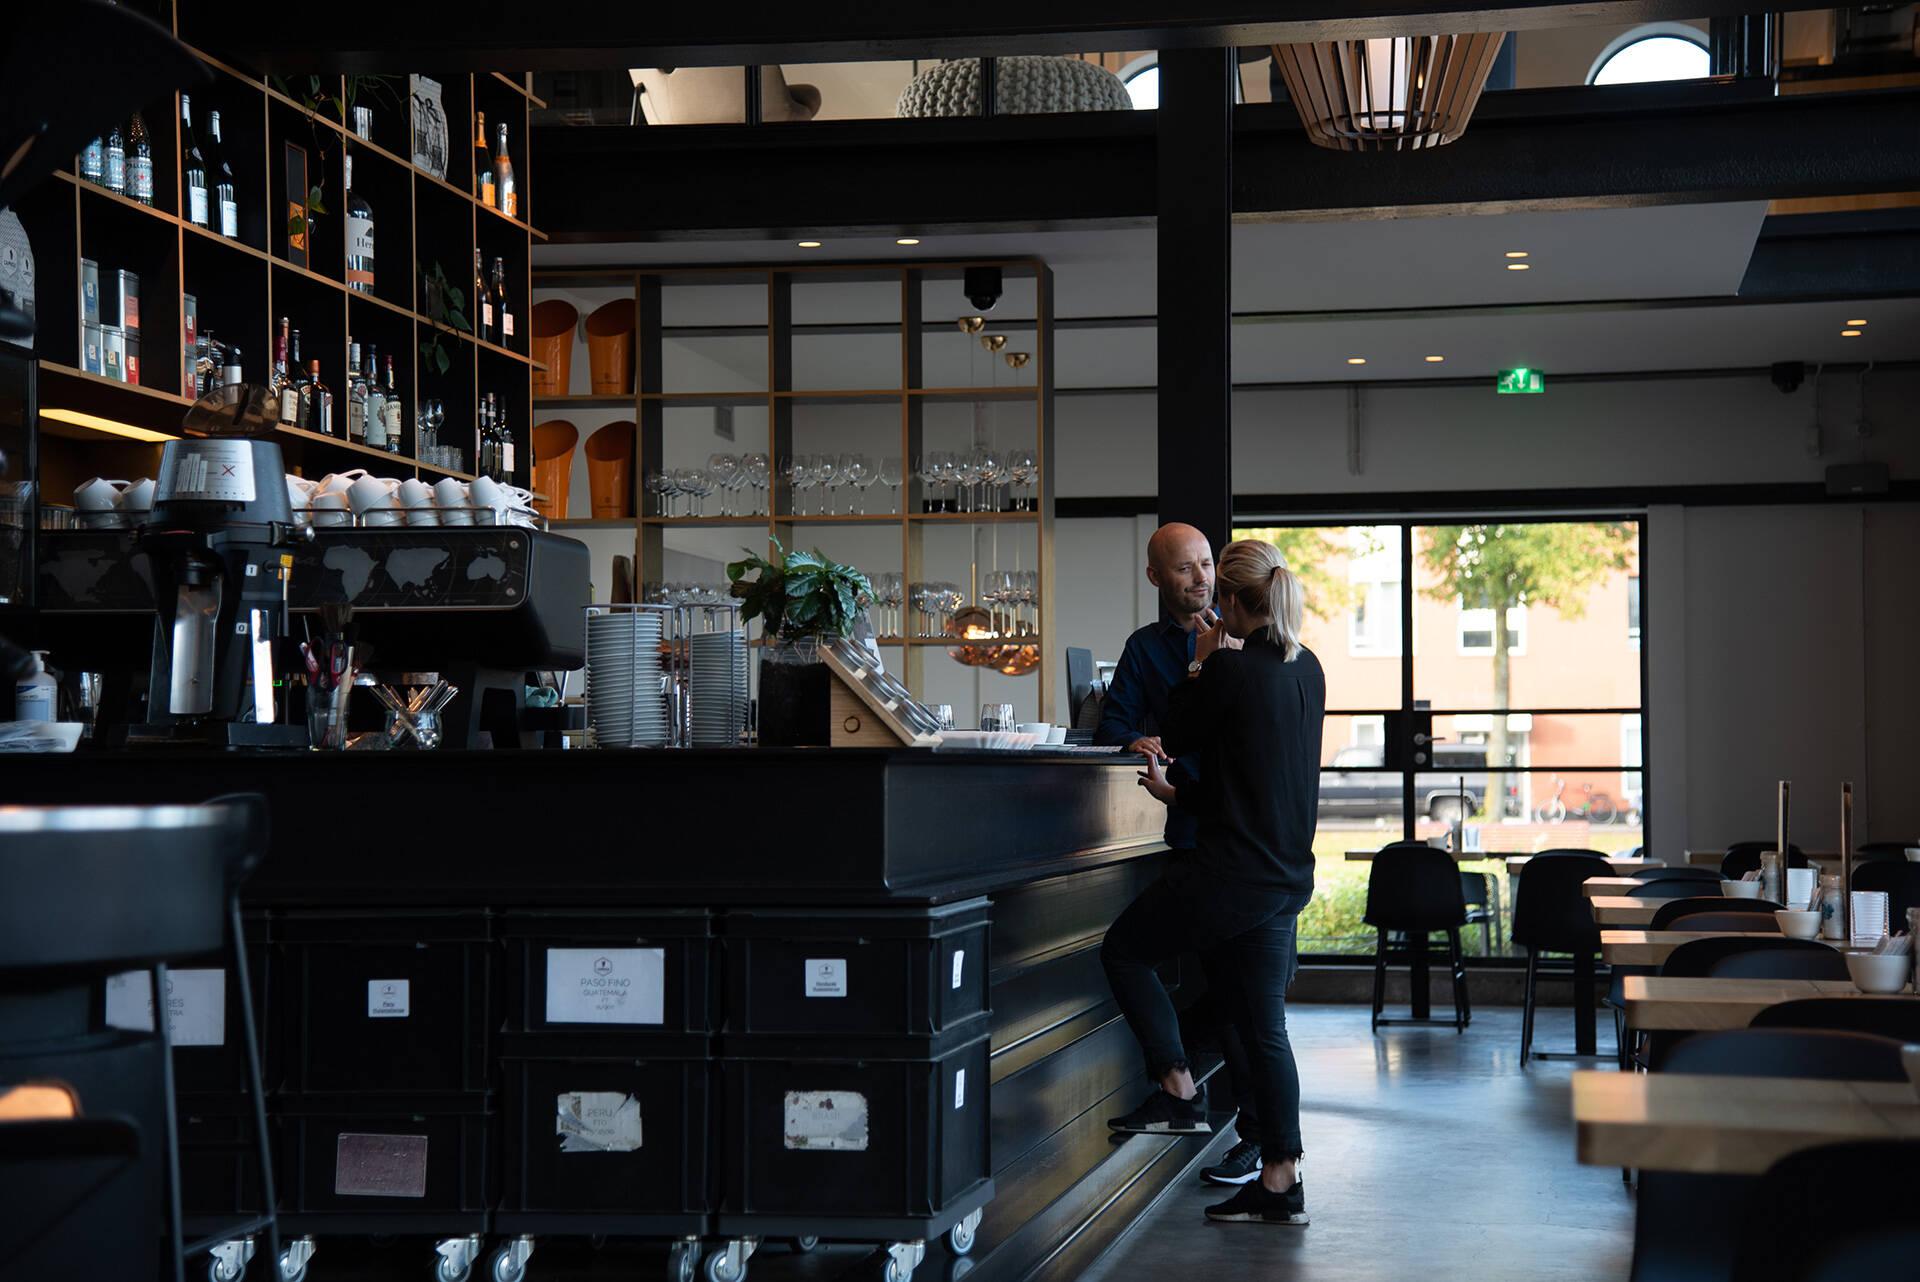 Capriole Café in Den Haag